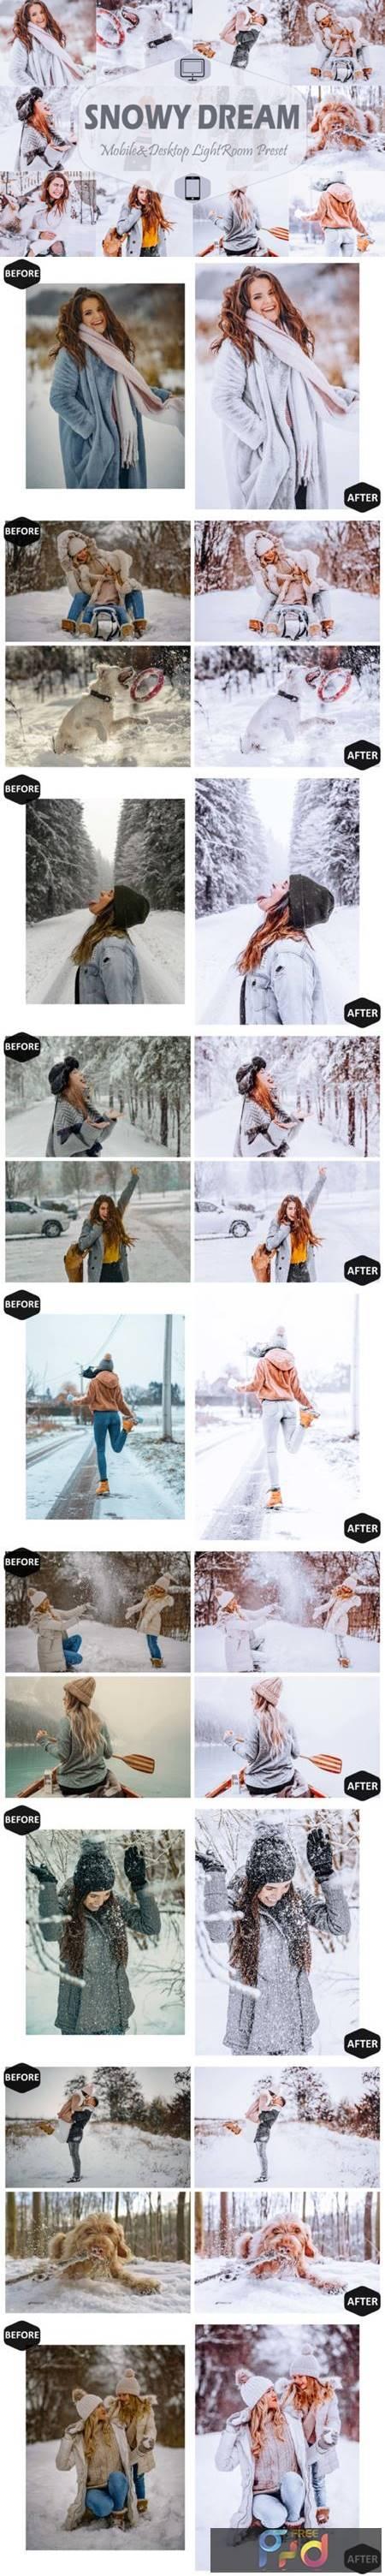 10 Snowy Dream Mobile & Desktop Lightroom 7099219 1